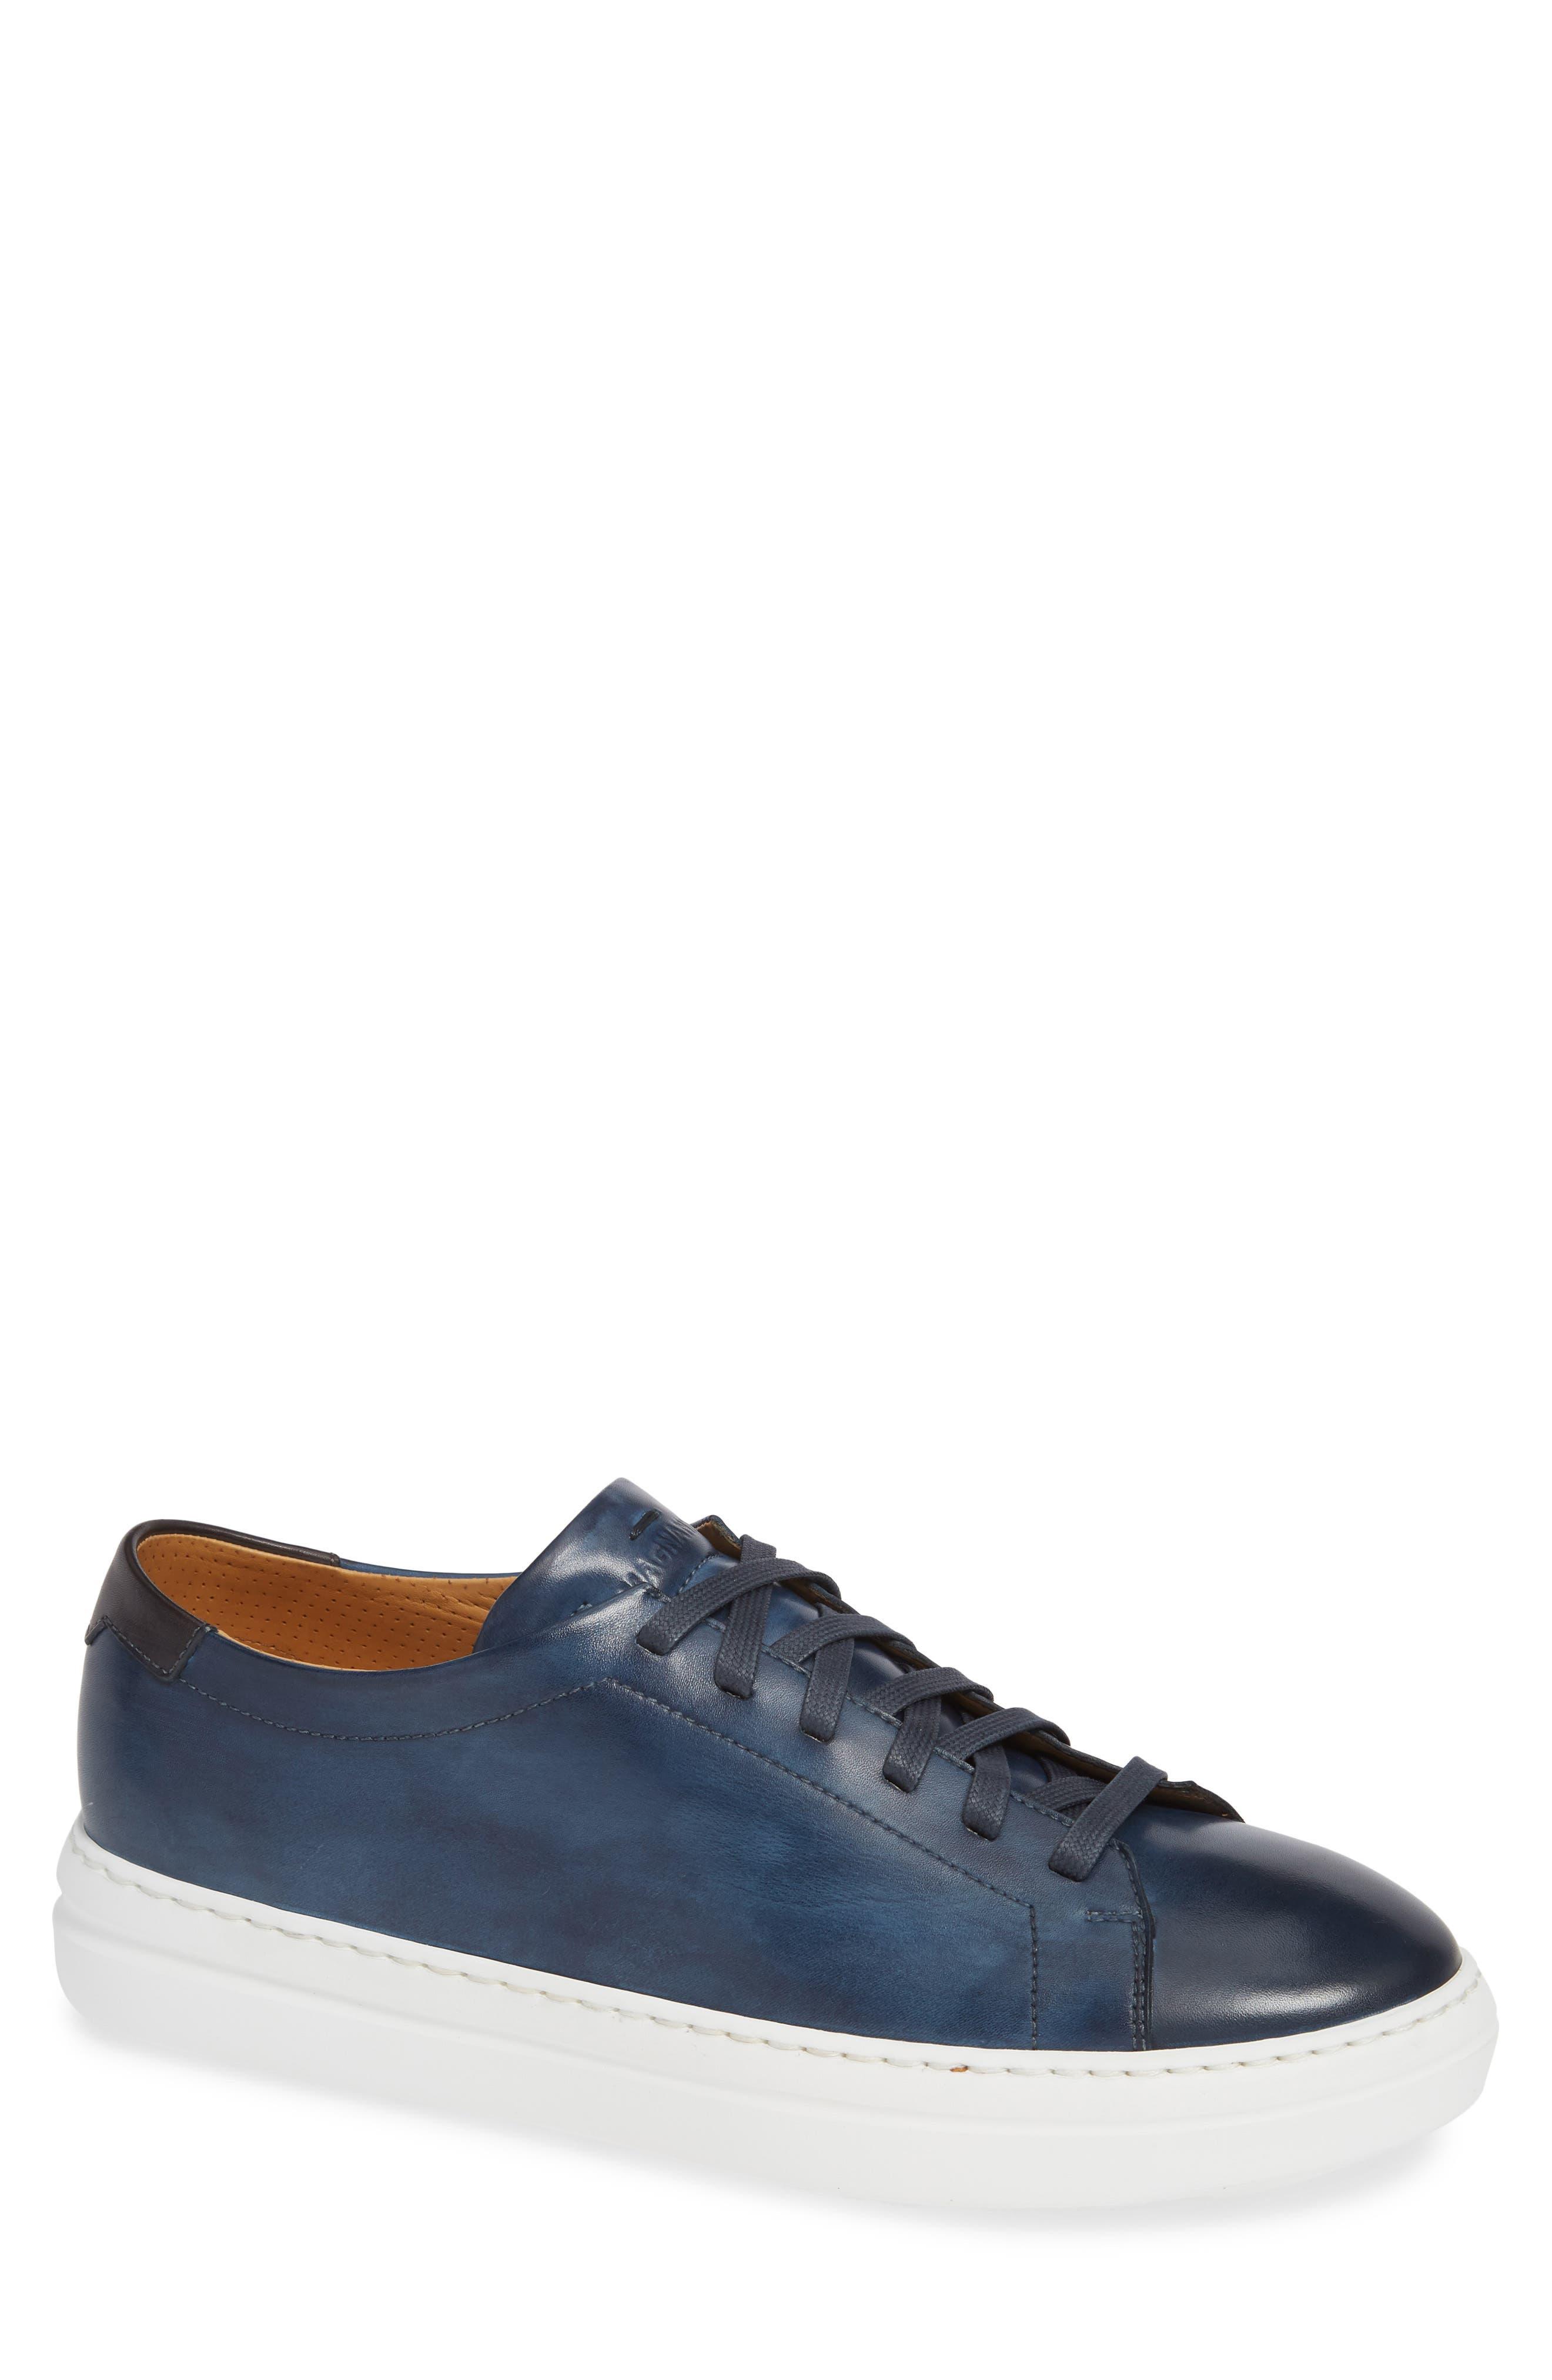 MAGNANNI Bartolo Sneaker, Main, color, NAVY LEATHER